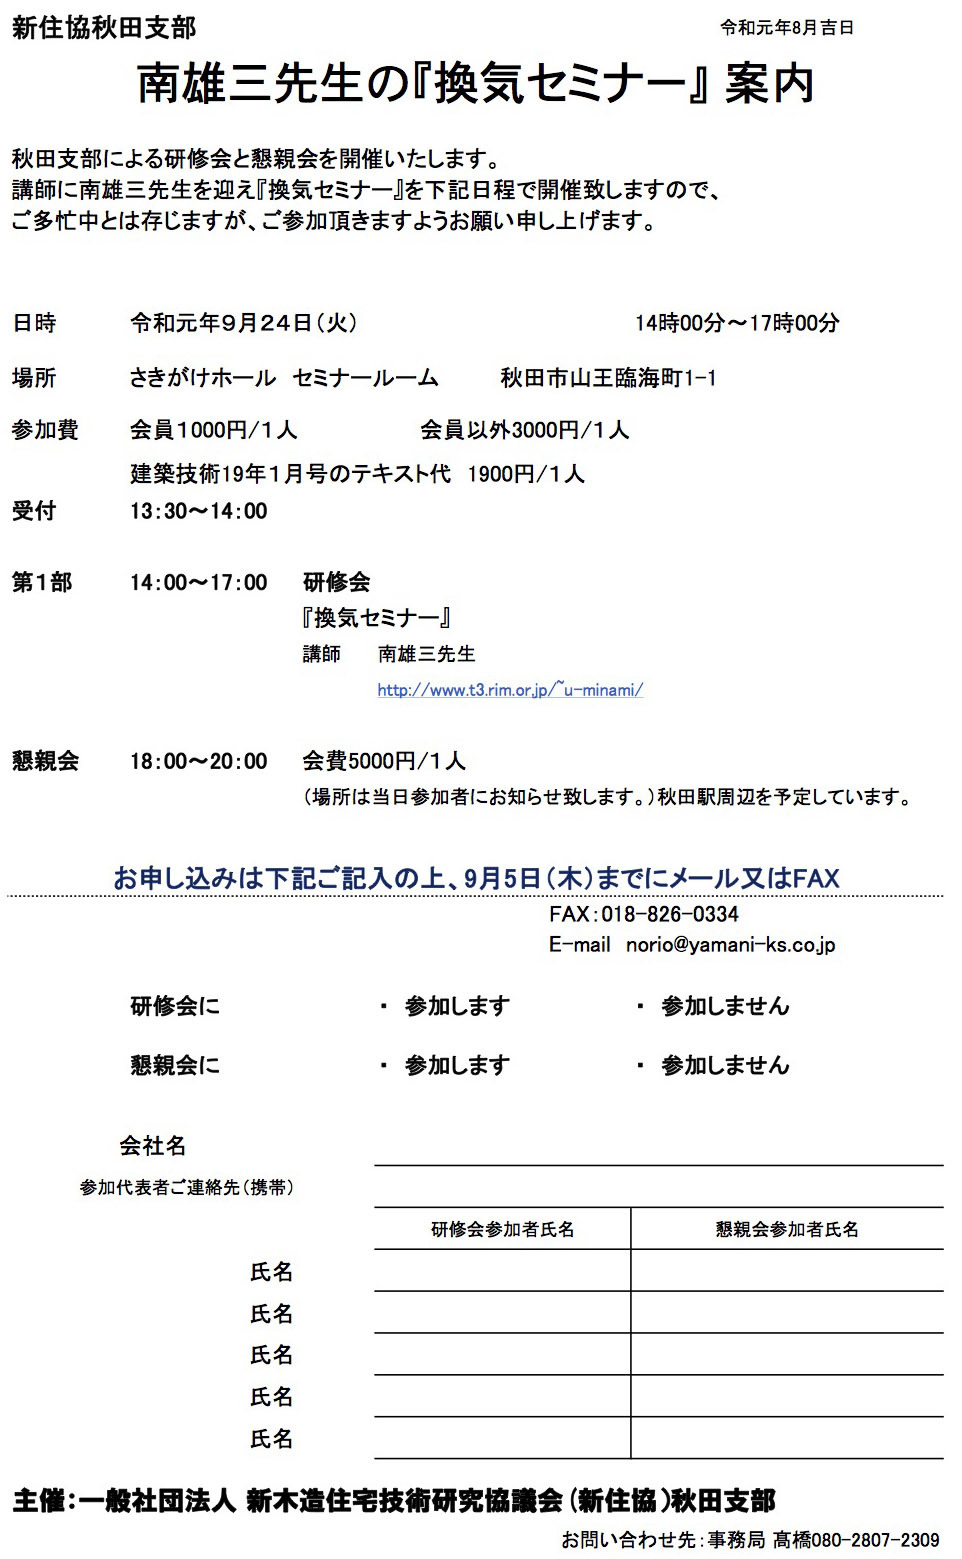 新住協秋田支部セミナー「換気」南雄三_e0054299_14155832.jpg